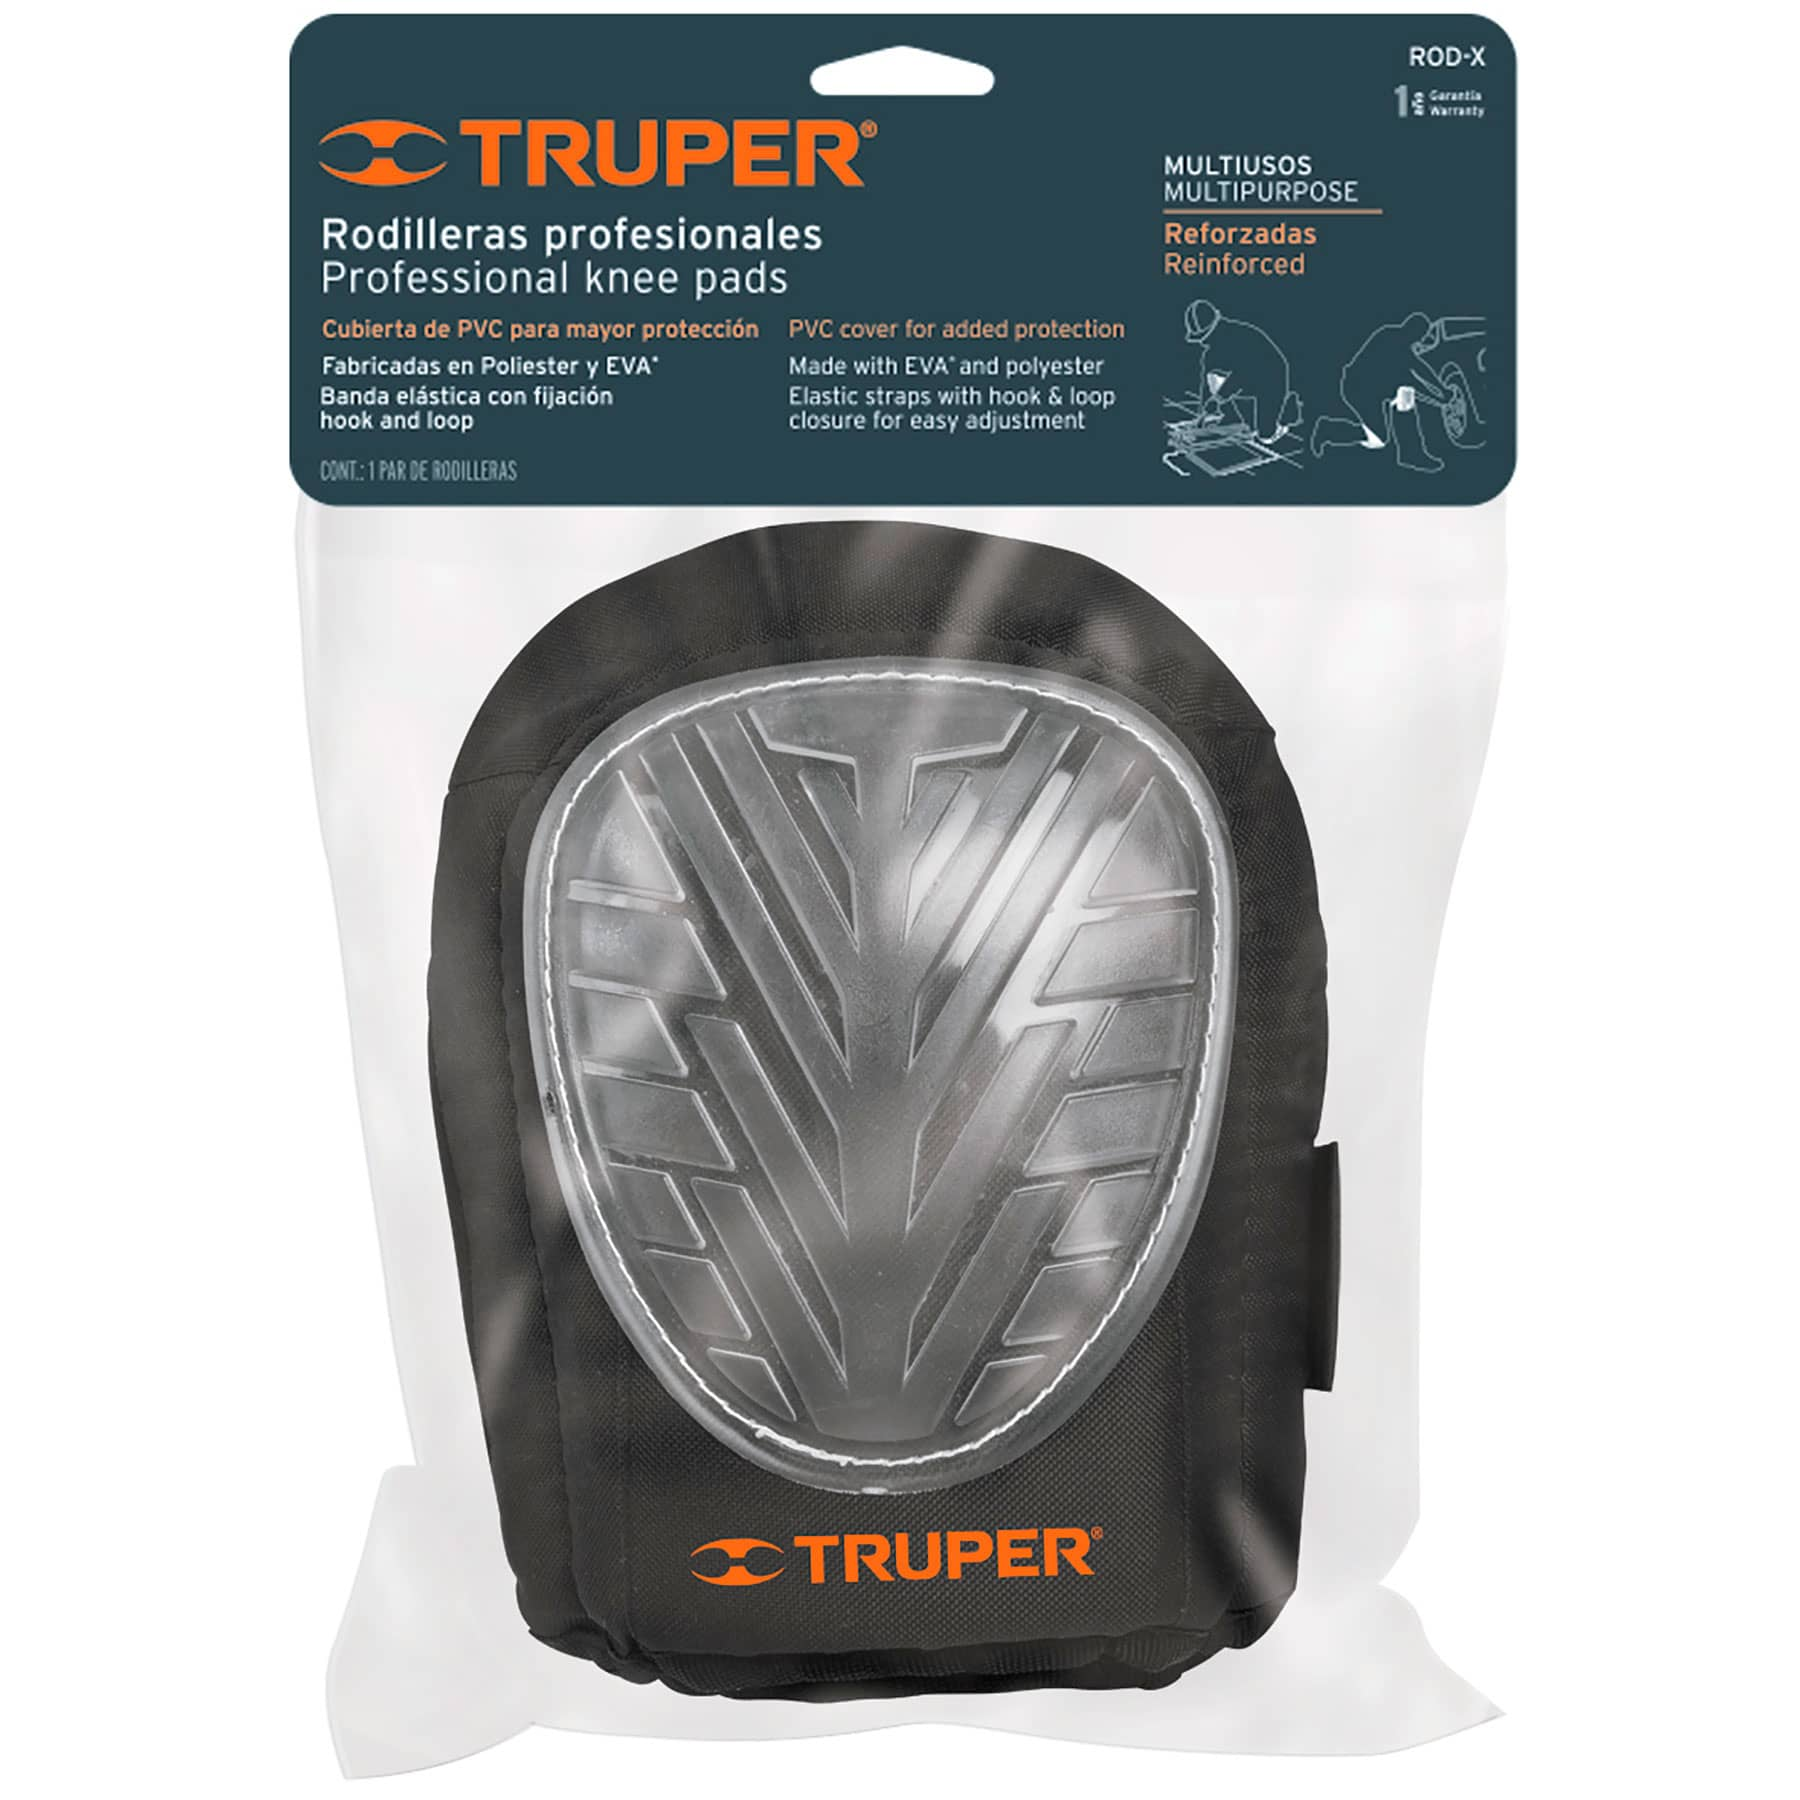 Truper - Rodilleras profesionales de PVC